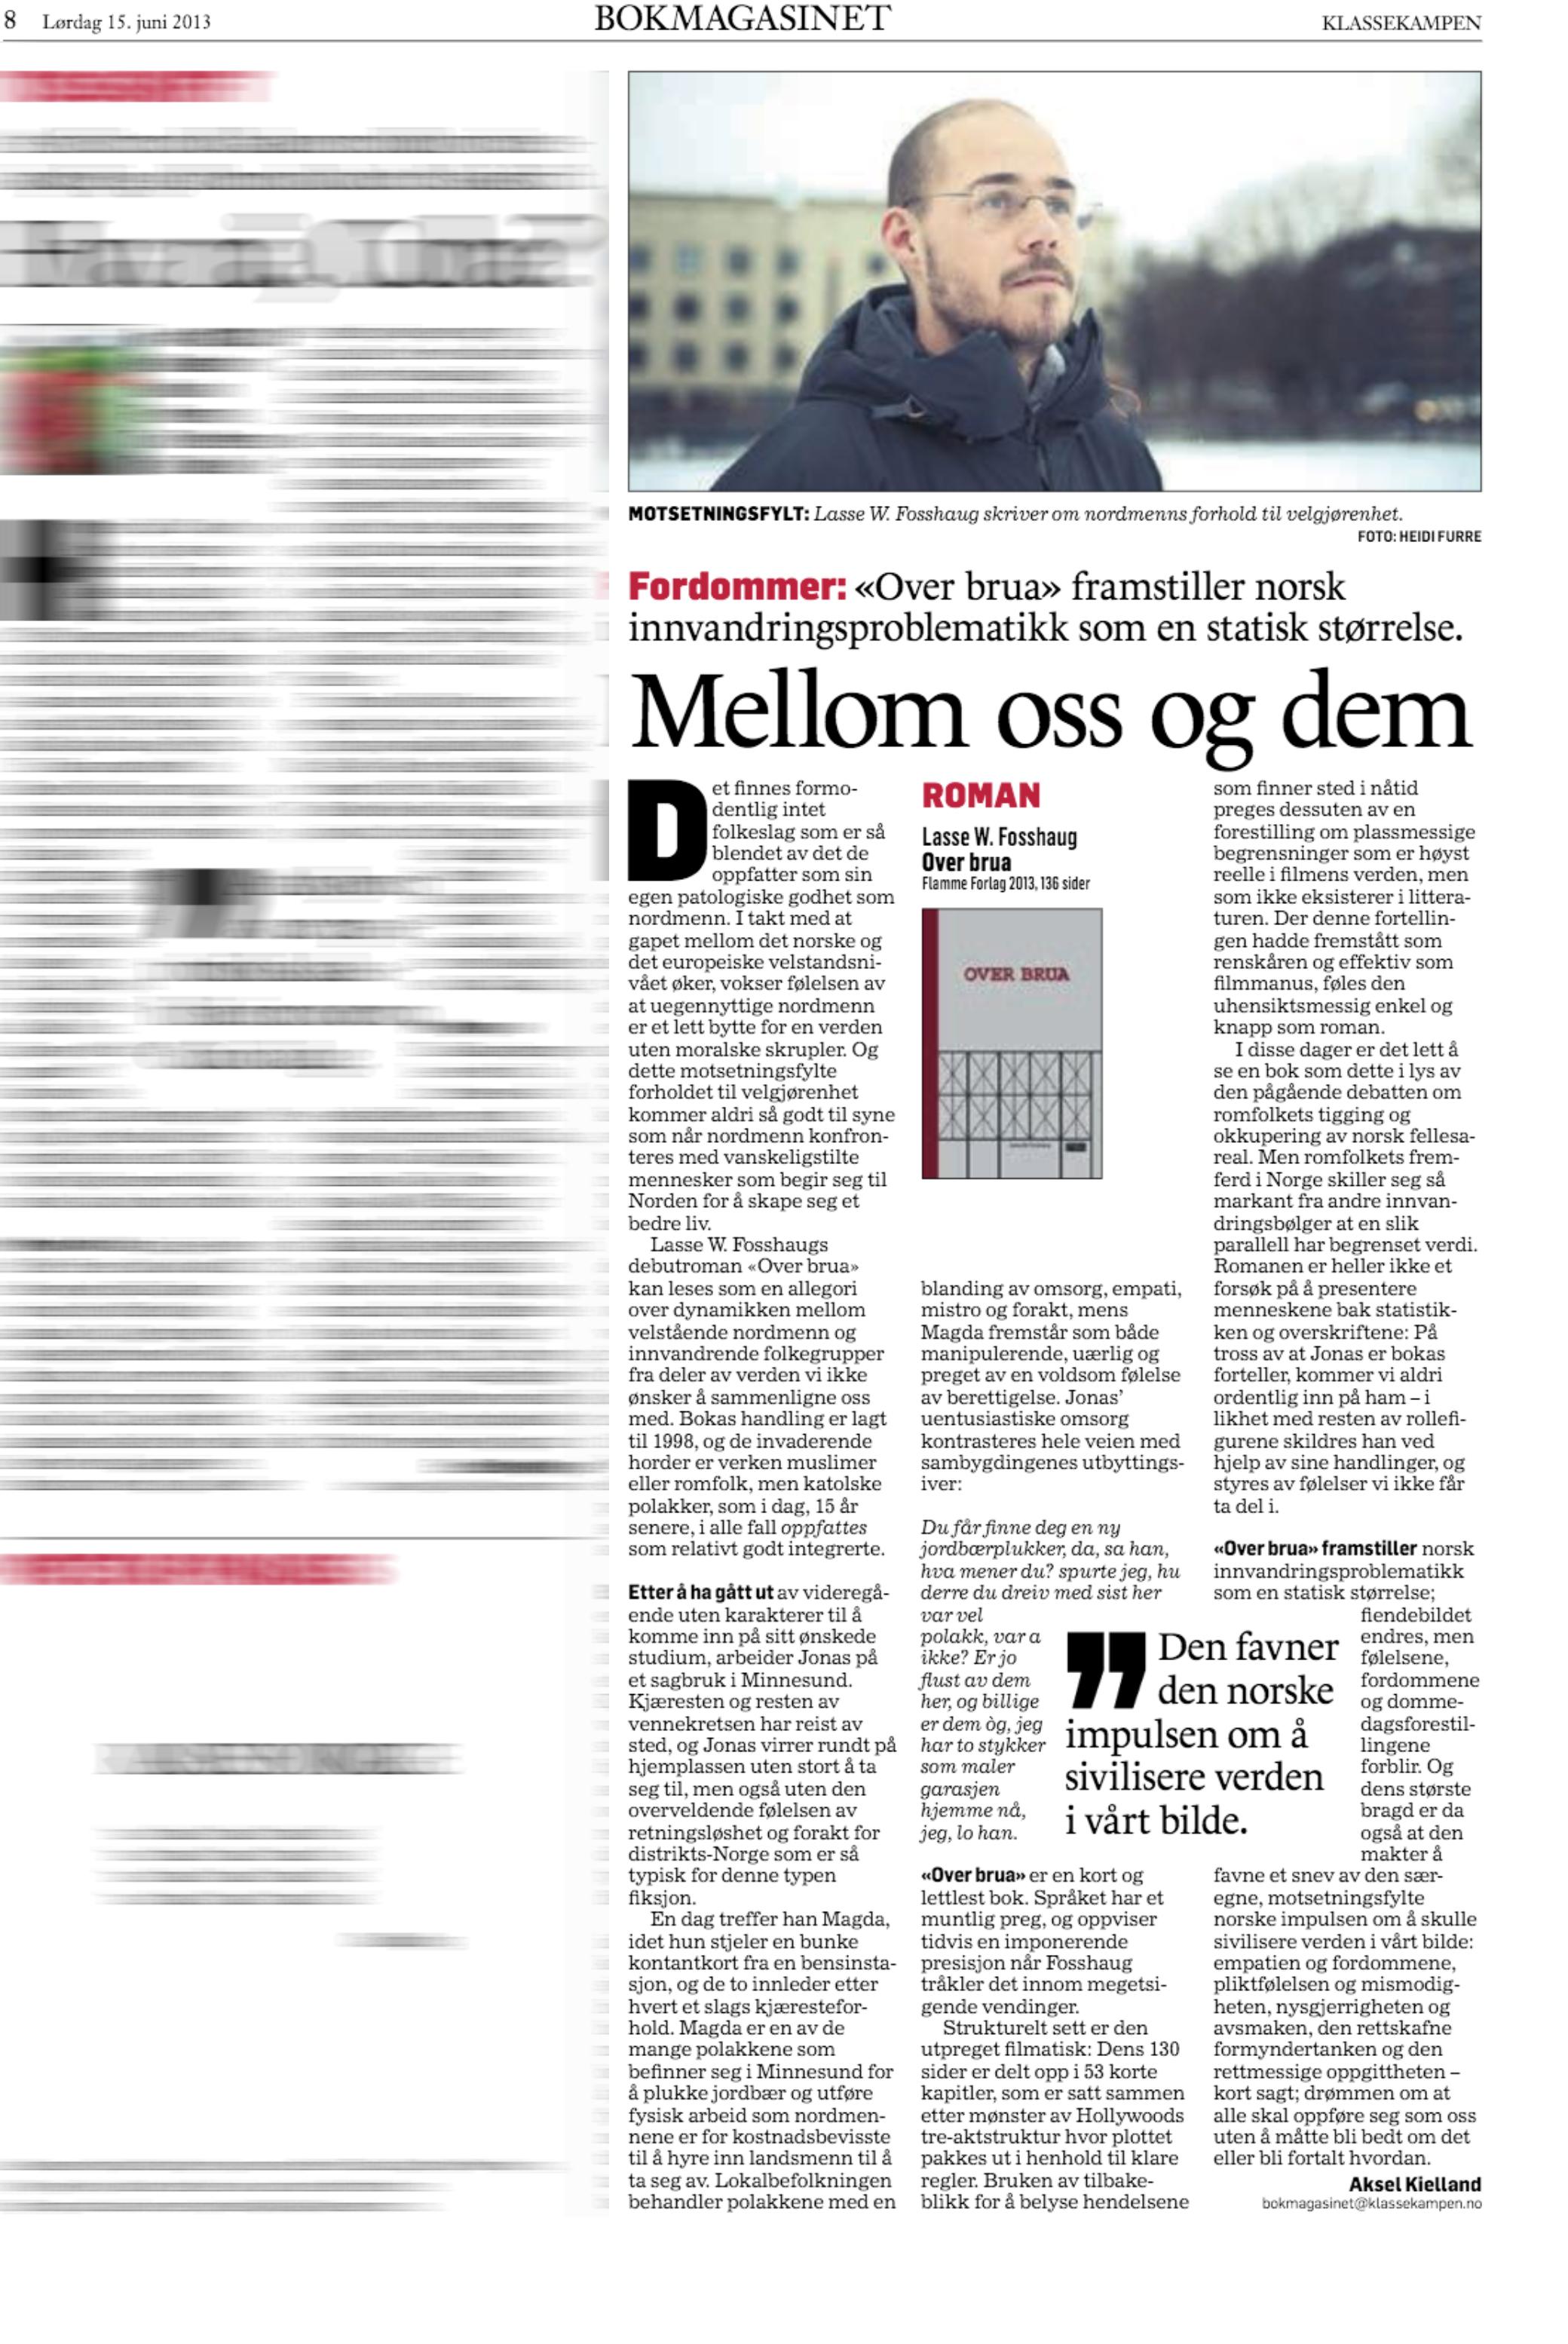 Faksimile Klassekampen Bokmagasinet 15. juni 2013